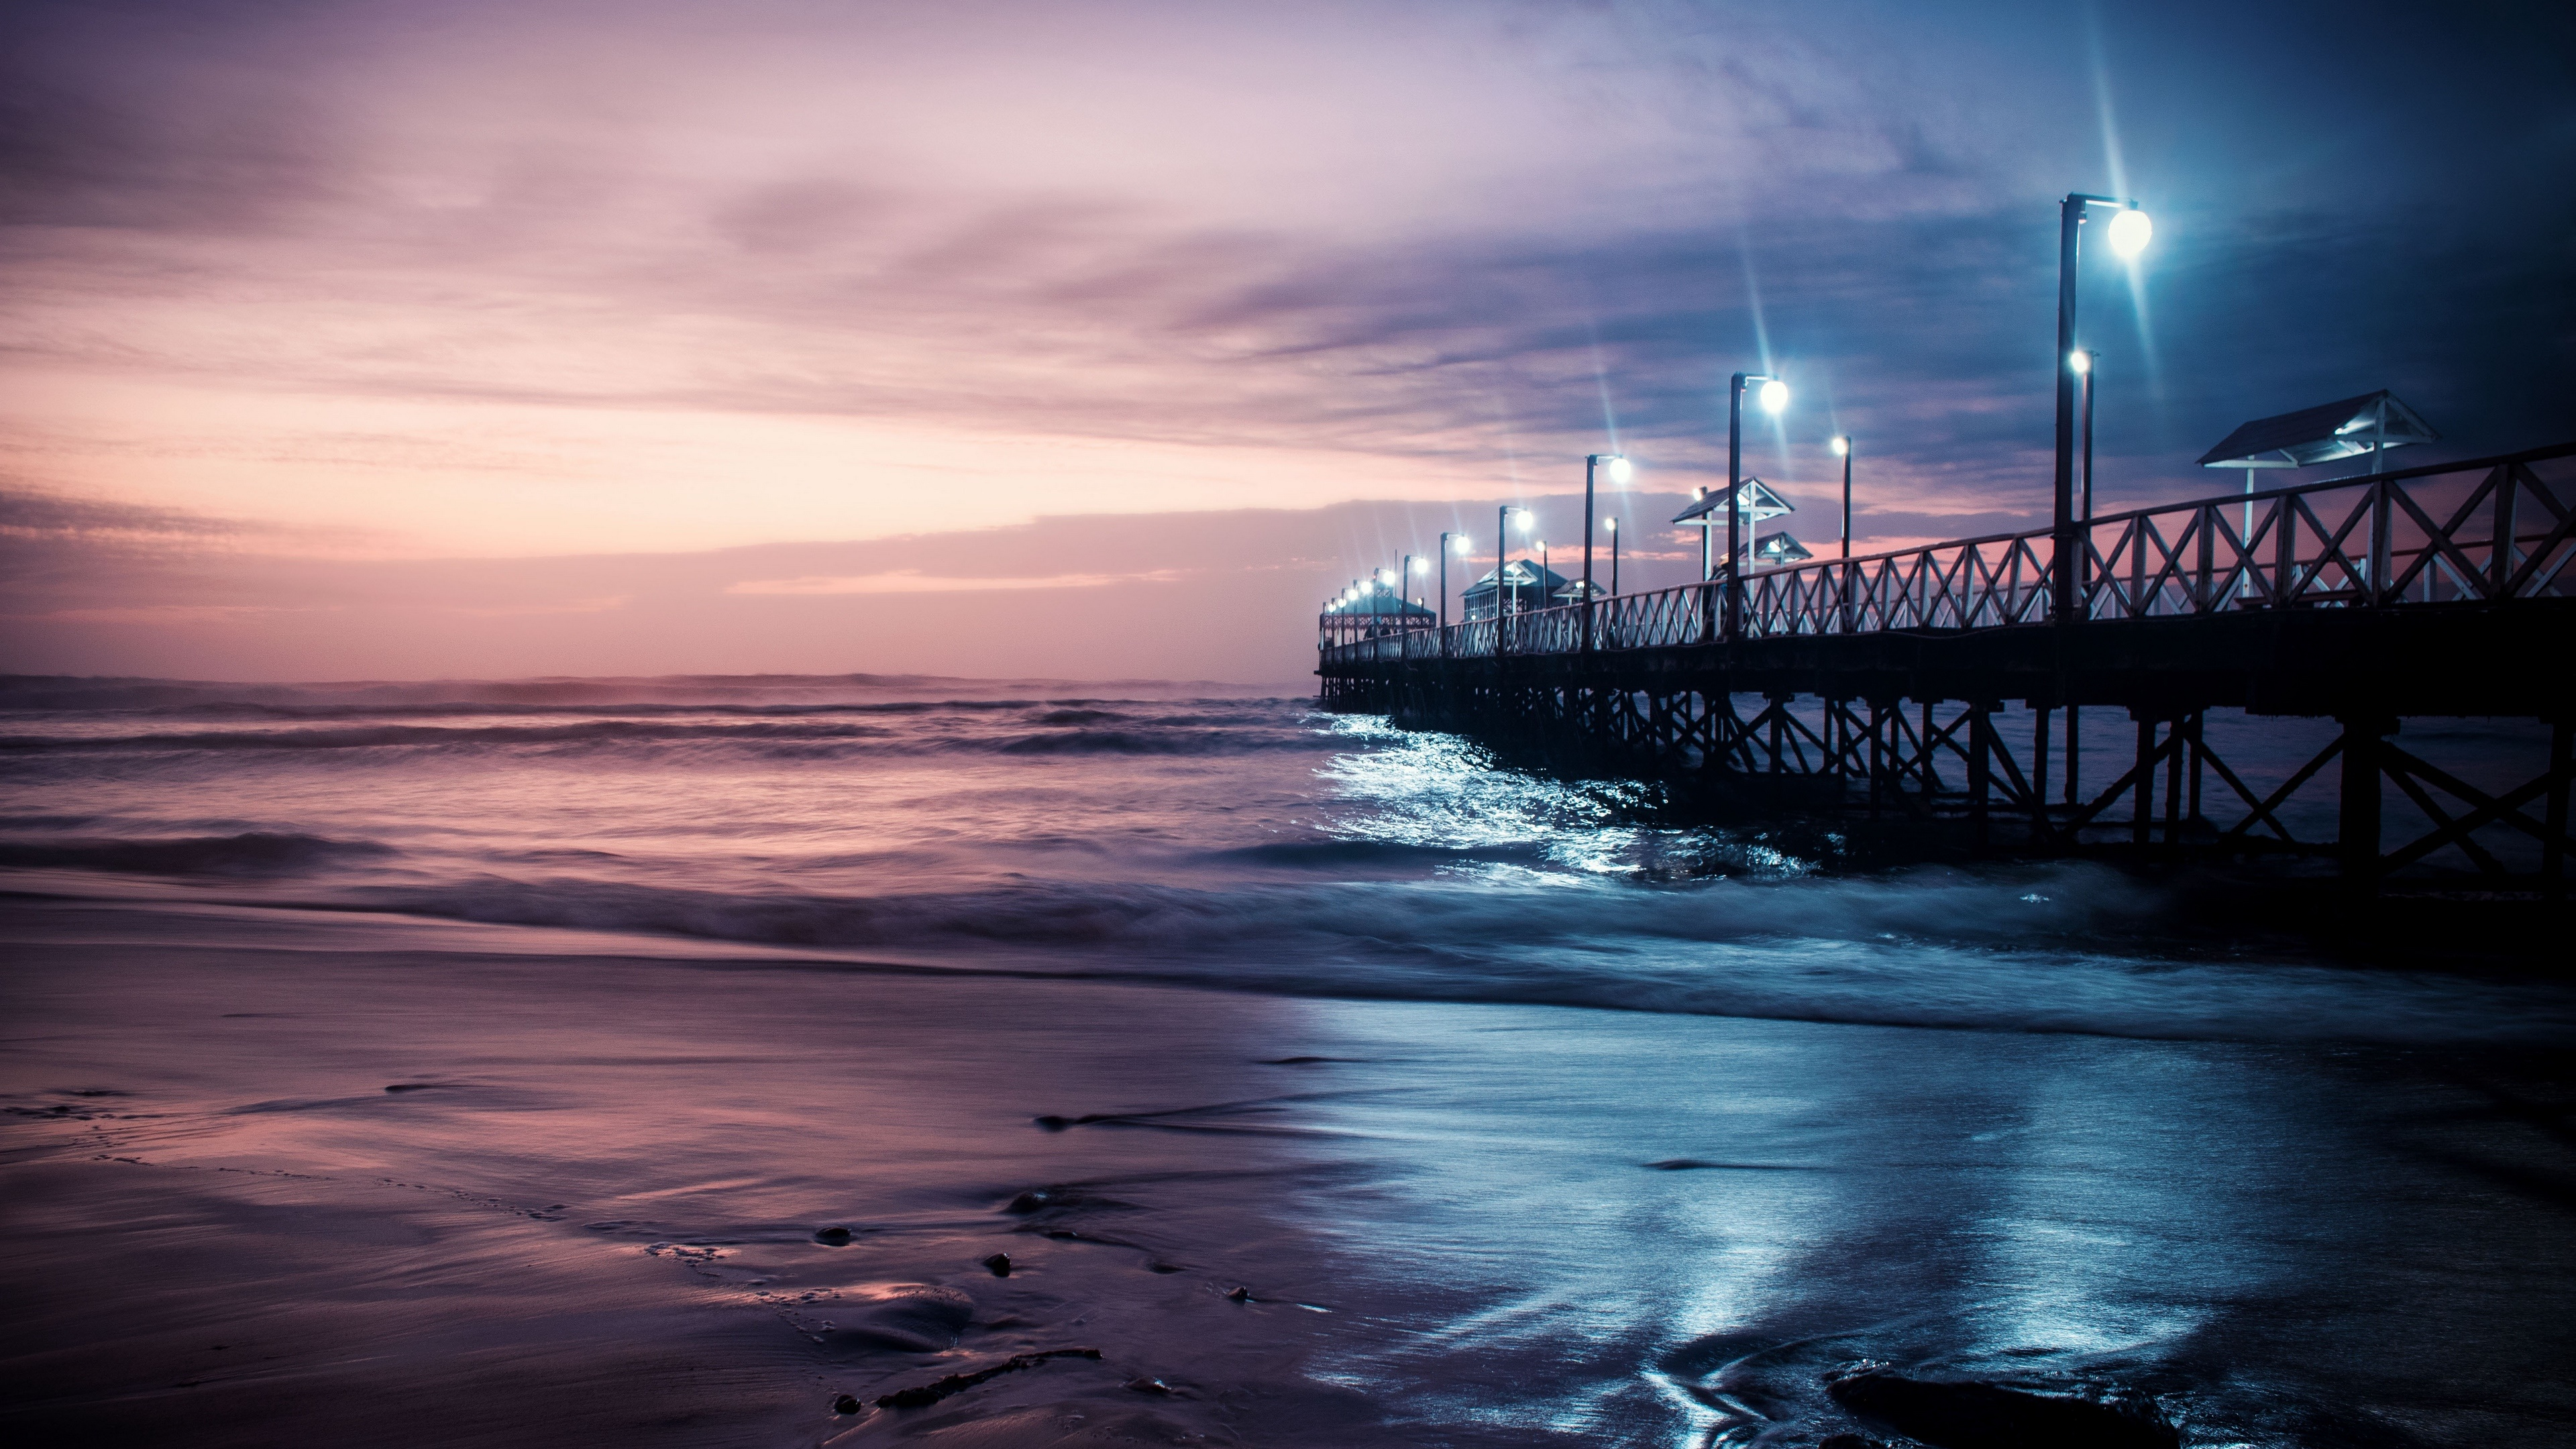 Pier in the Huanchaco Beach at dusk (Peru) wallpaper